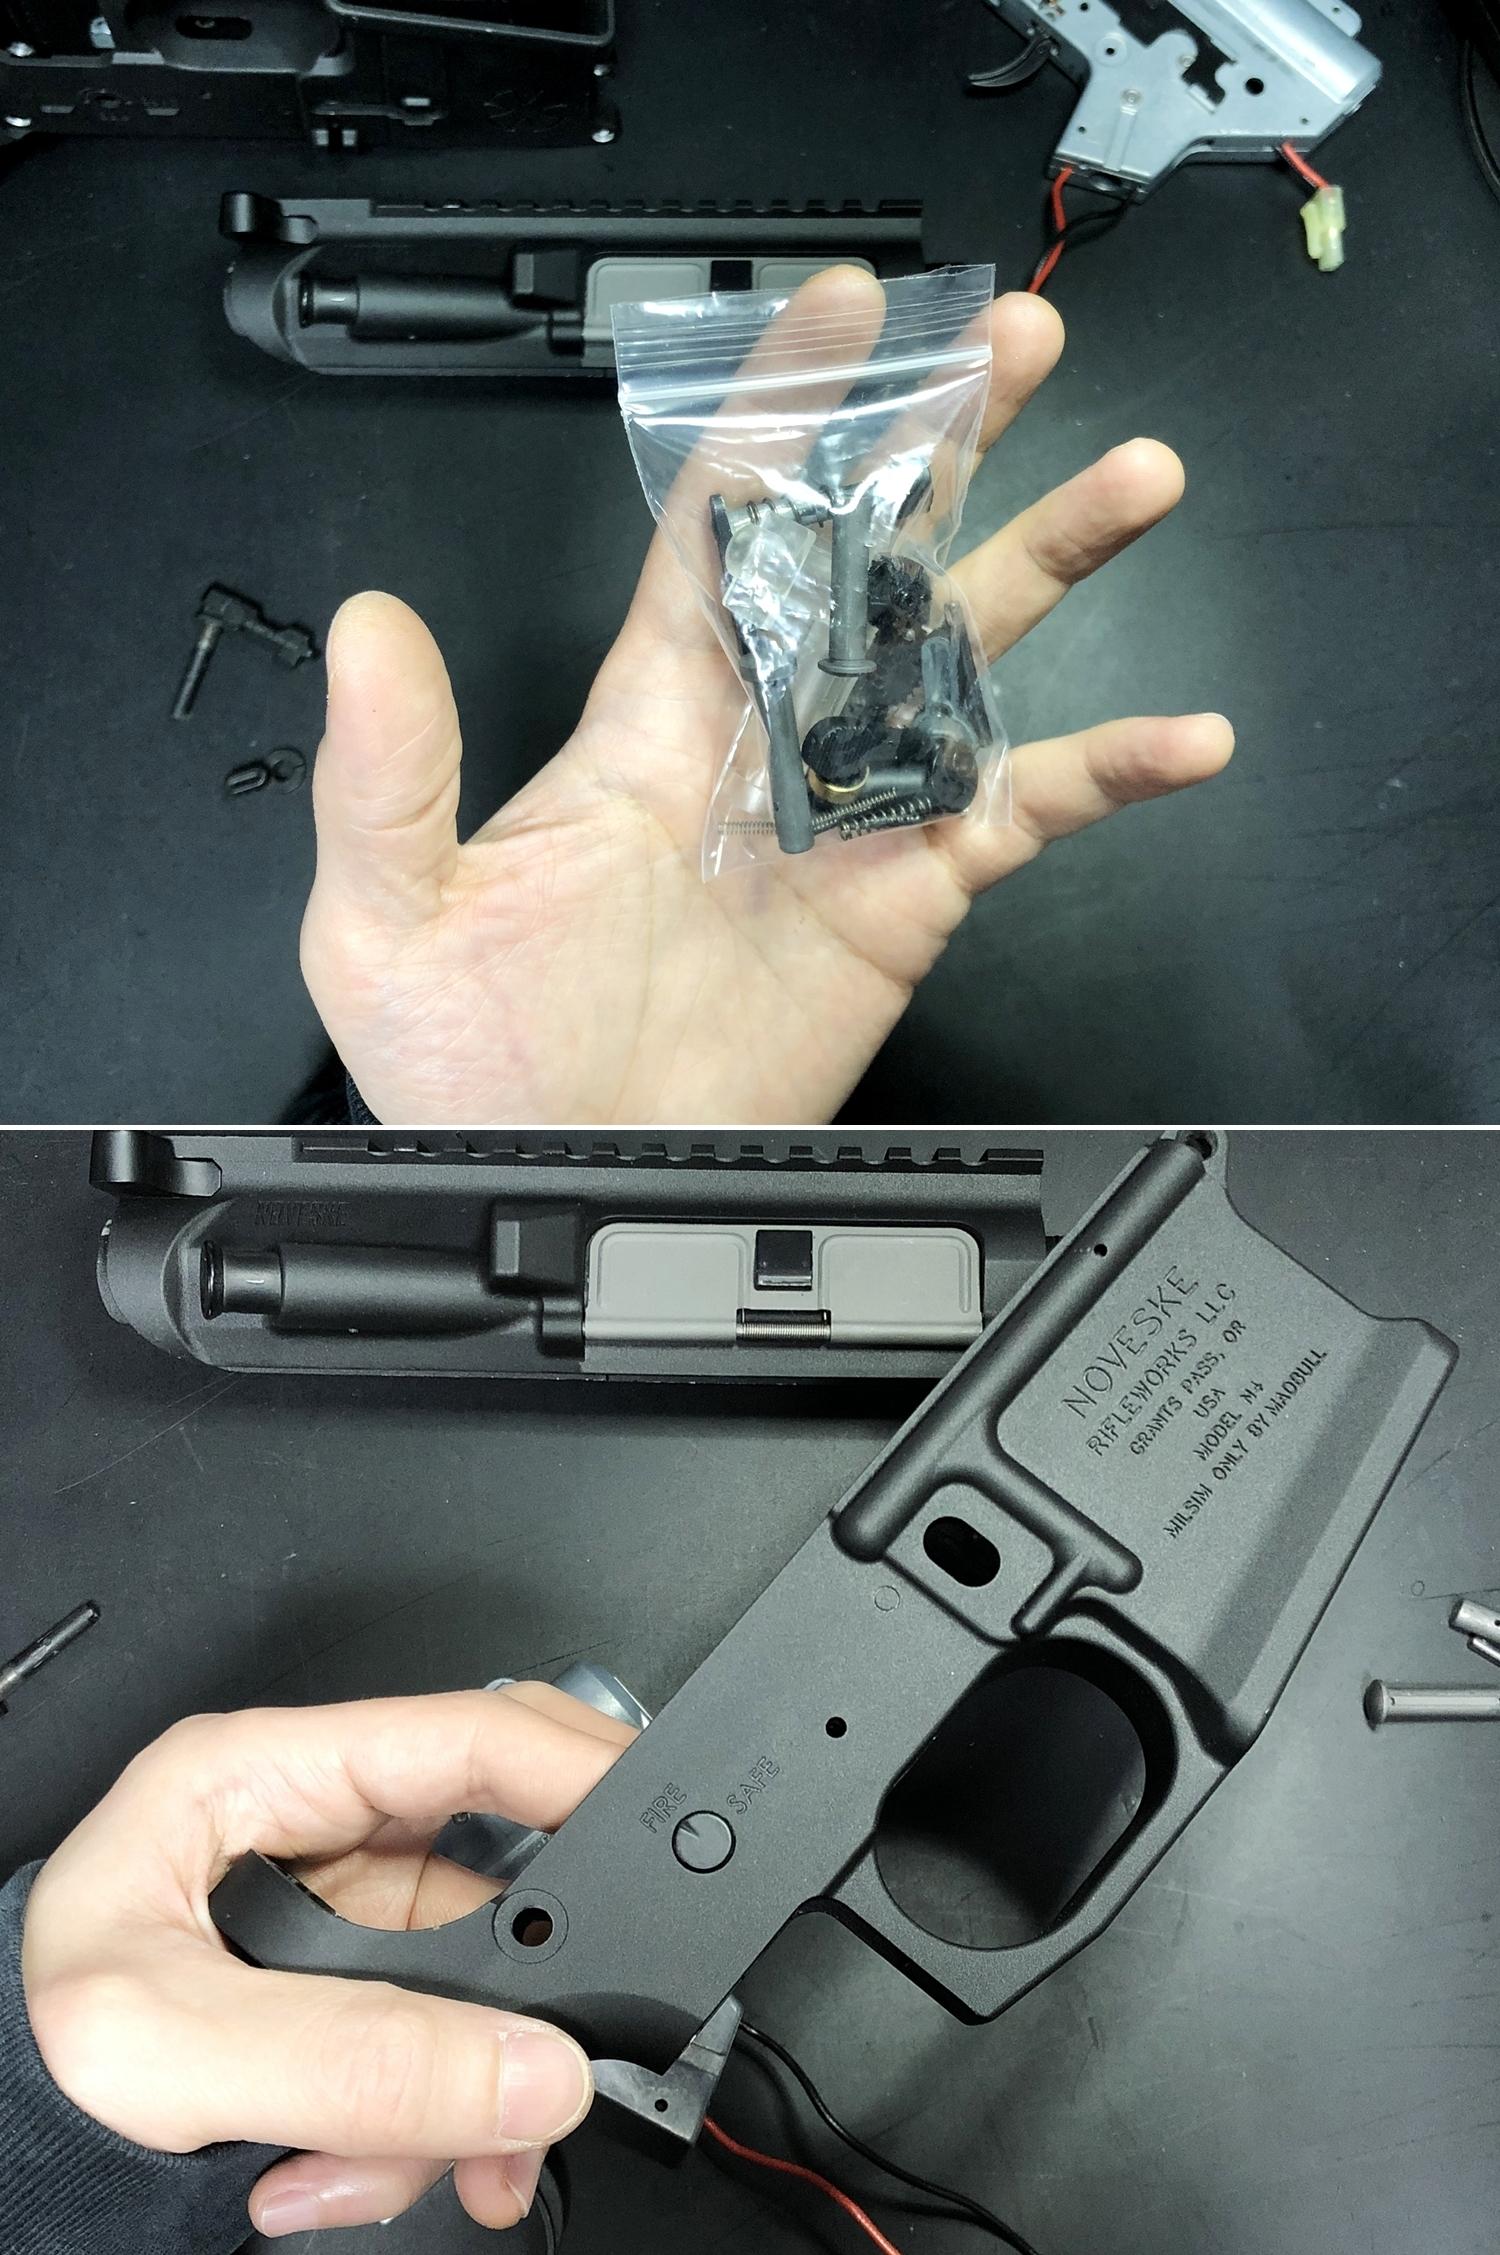 6 NOVESKE GEN3 N4 BY MADBULL!! 『第一弾』 新たにSTD民間系ARを作り始めたいと思います!! STD AR-15 M4 スタンダード 電動ガン マルイ ノベスケ ノベスキー マットブル メタルフレーム 動作テスト 組込 取付 カス